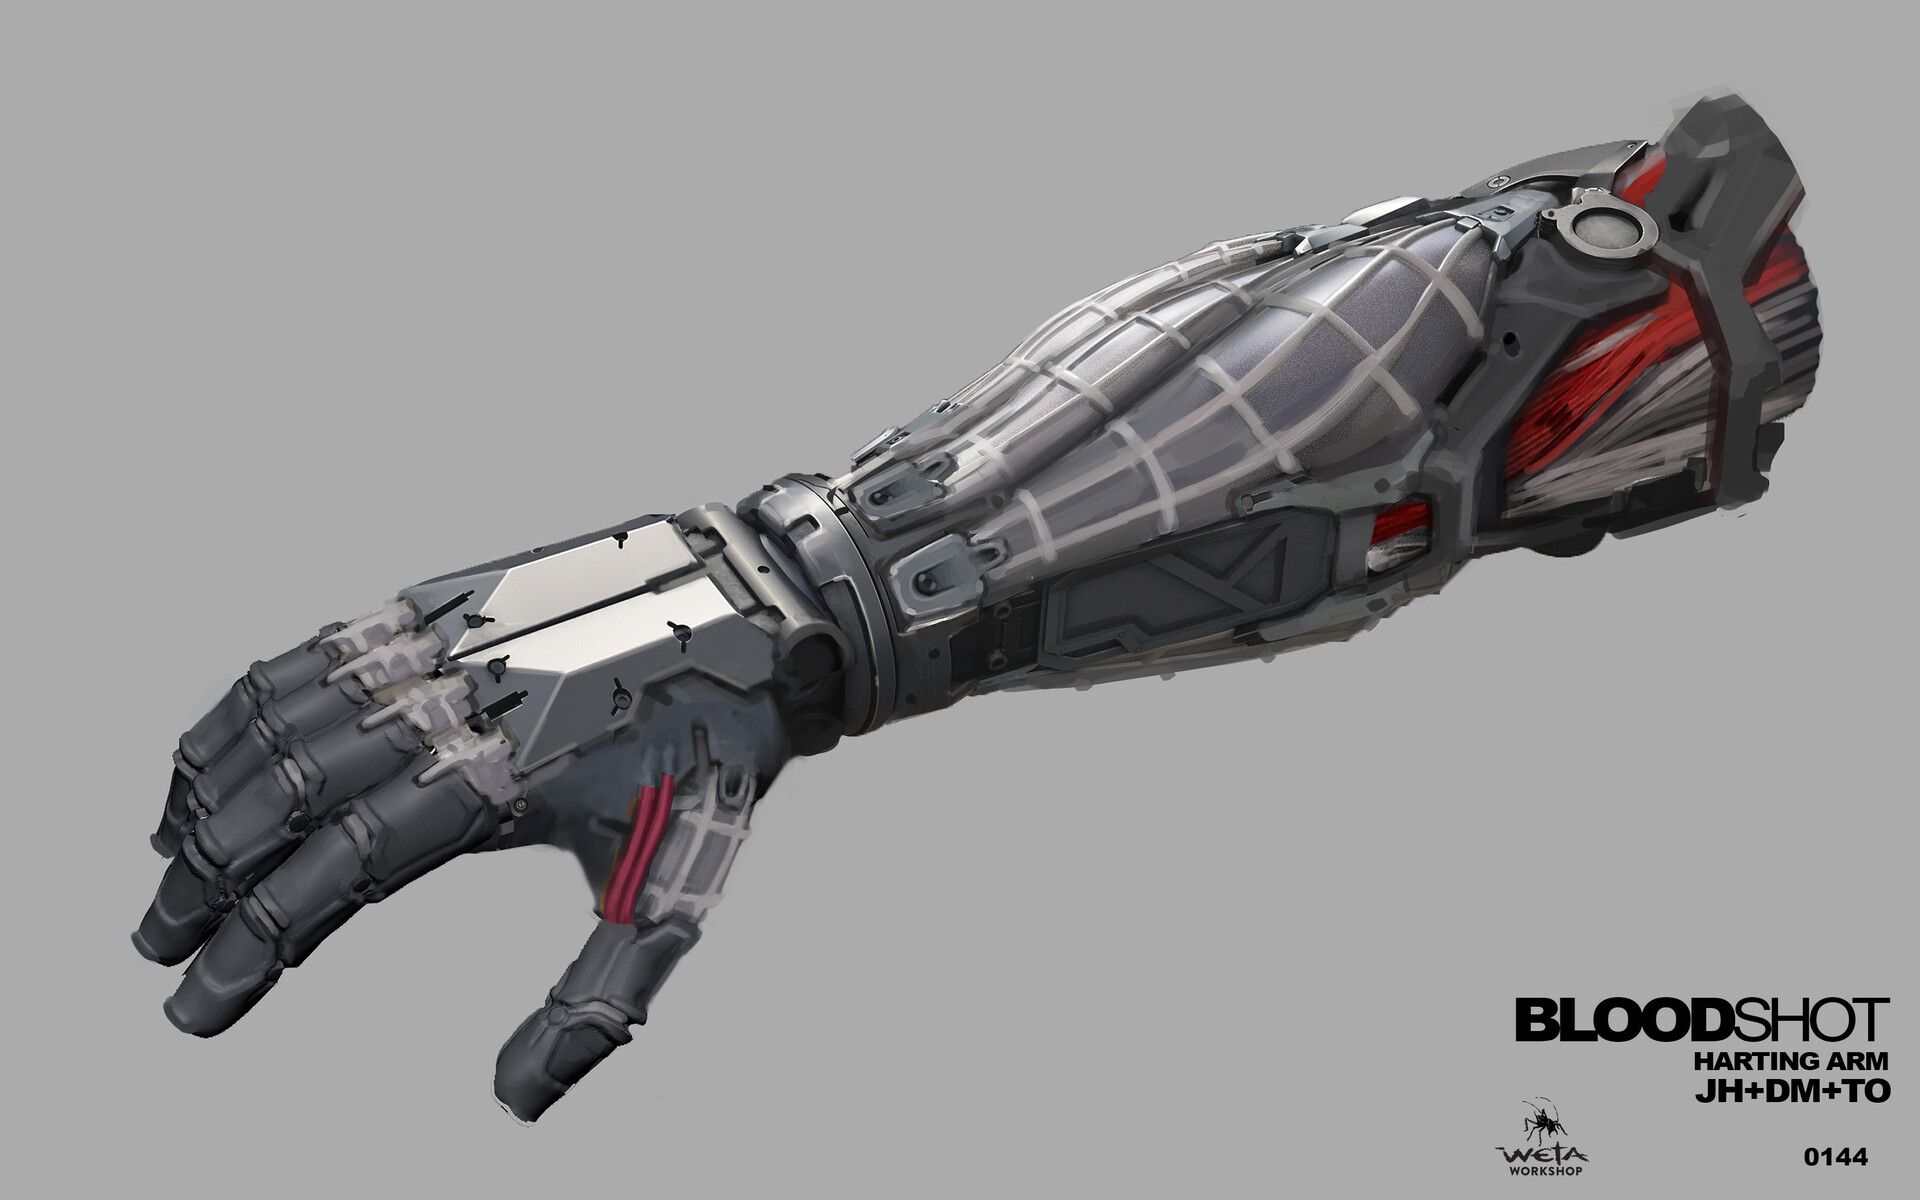 Harting Arm Detail - Artists: Thomas Oates + Dane Madgwick +  Jared Haley